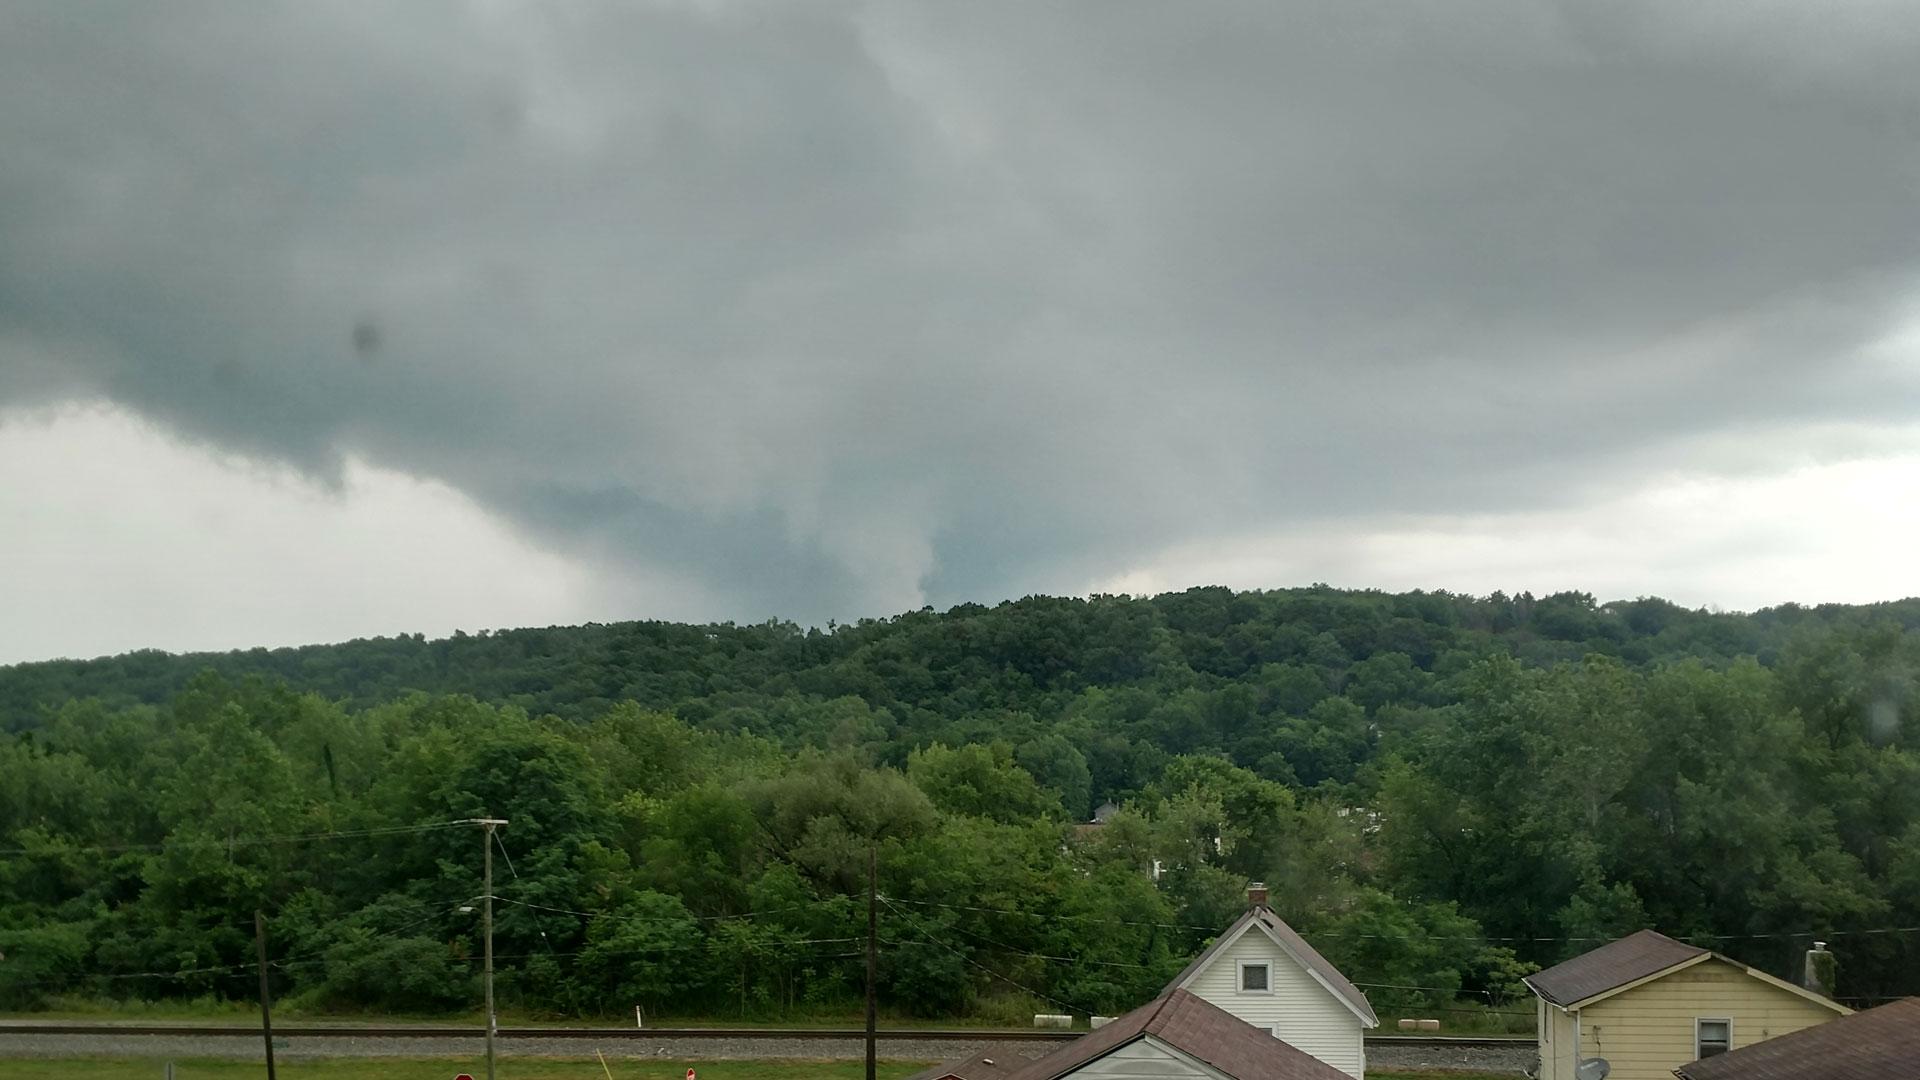 Severe storm, Lowellville